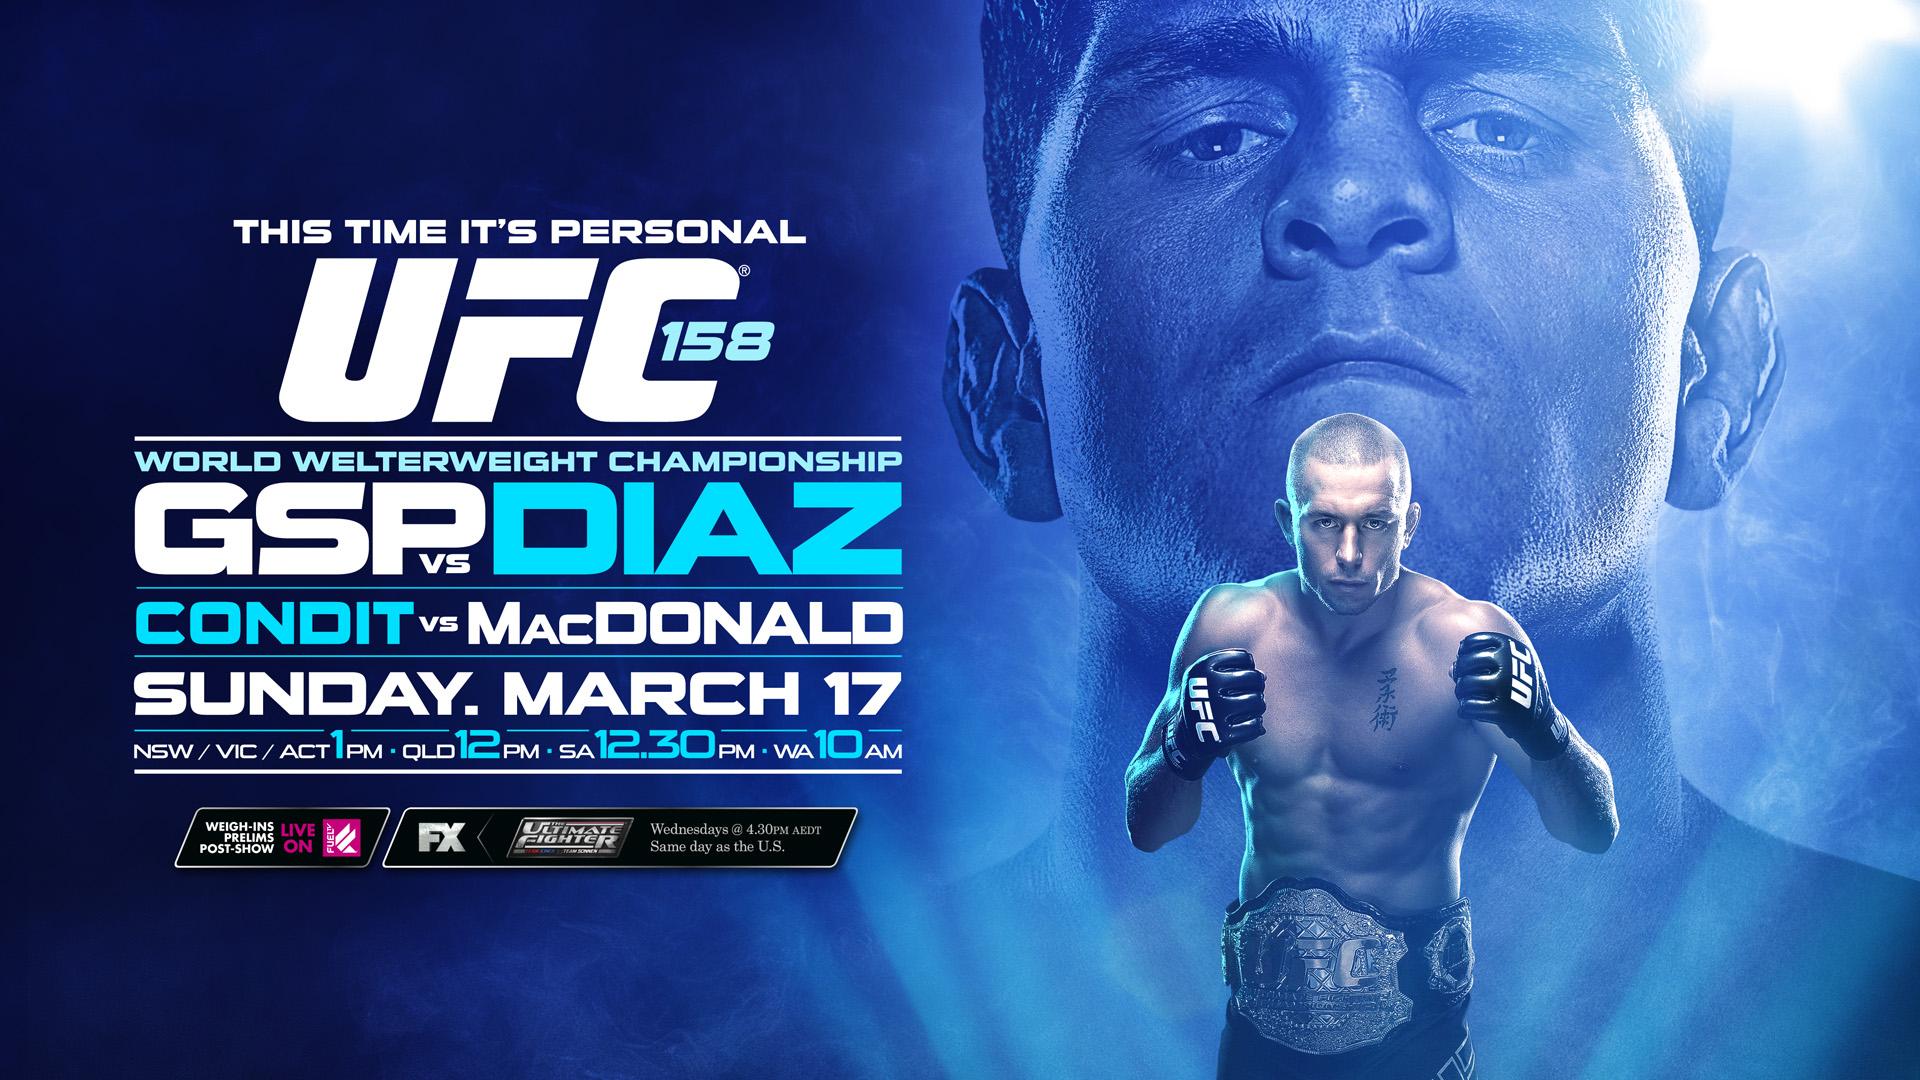 UFC-158-nightlife.jpg